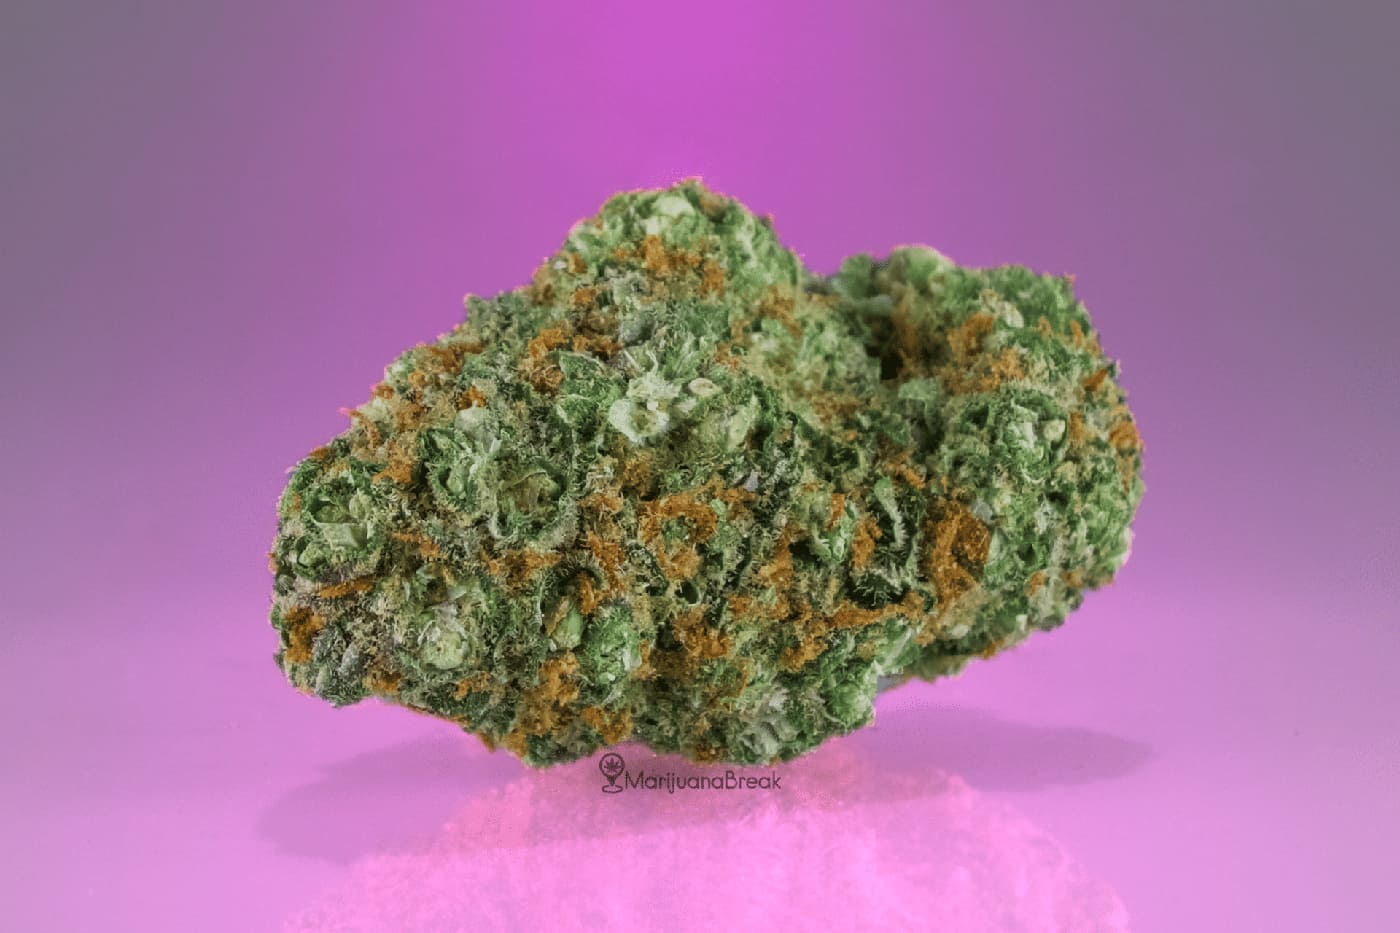 Cinderella 99 Marijuana Strain (Hybrid)